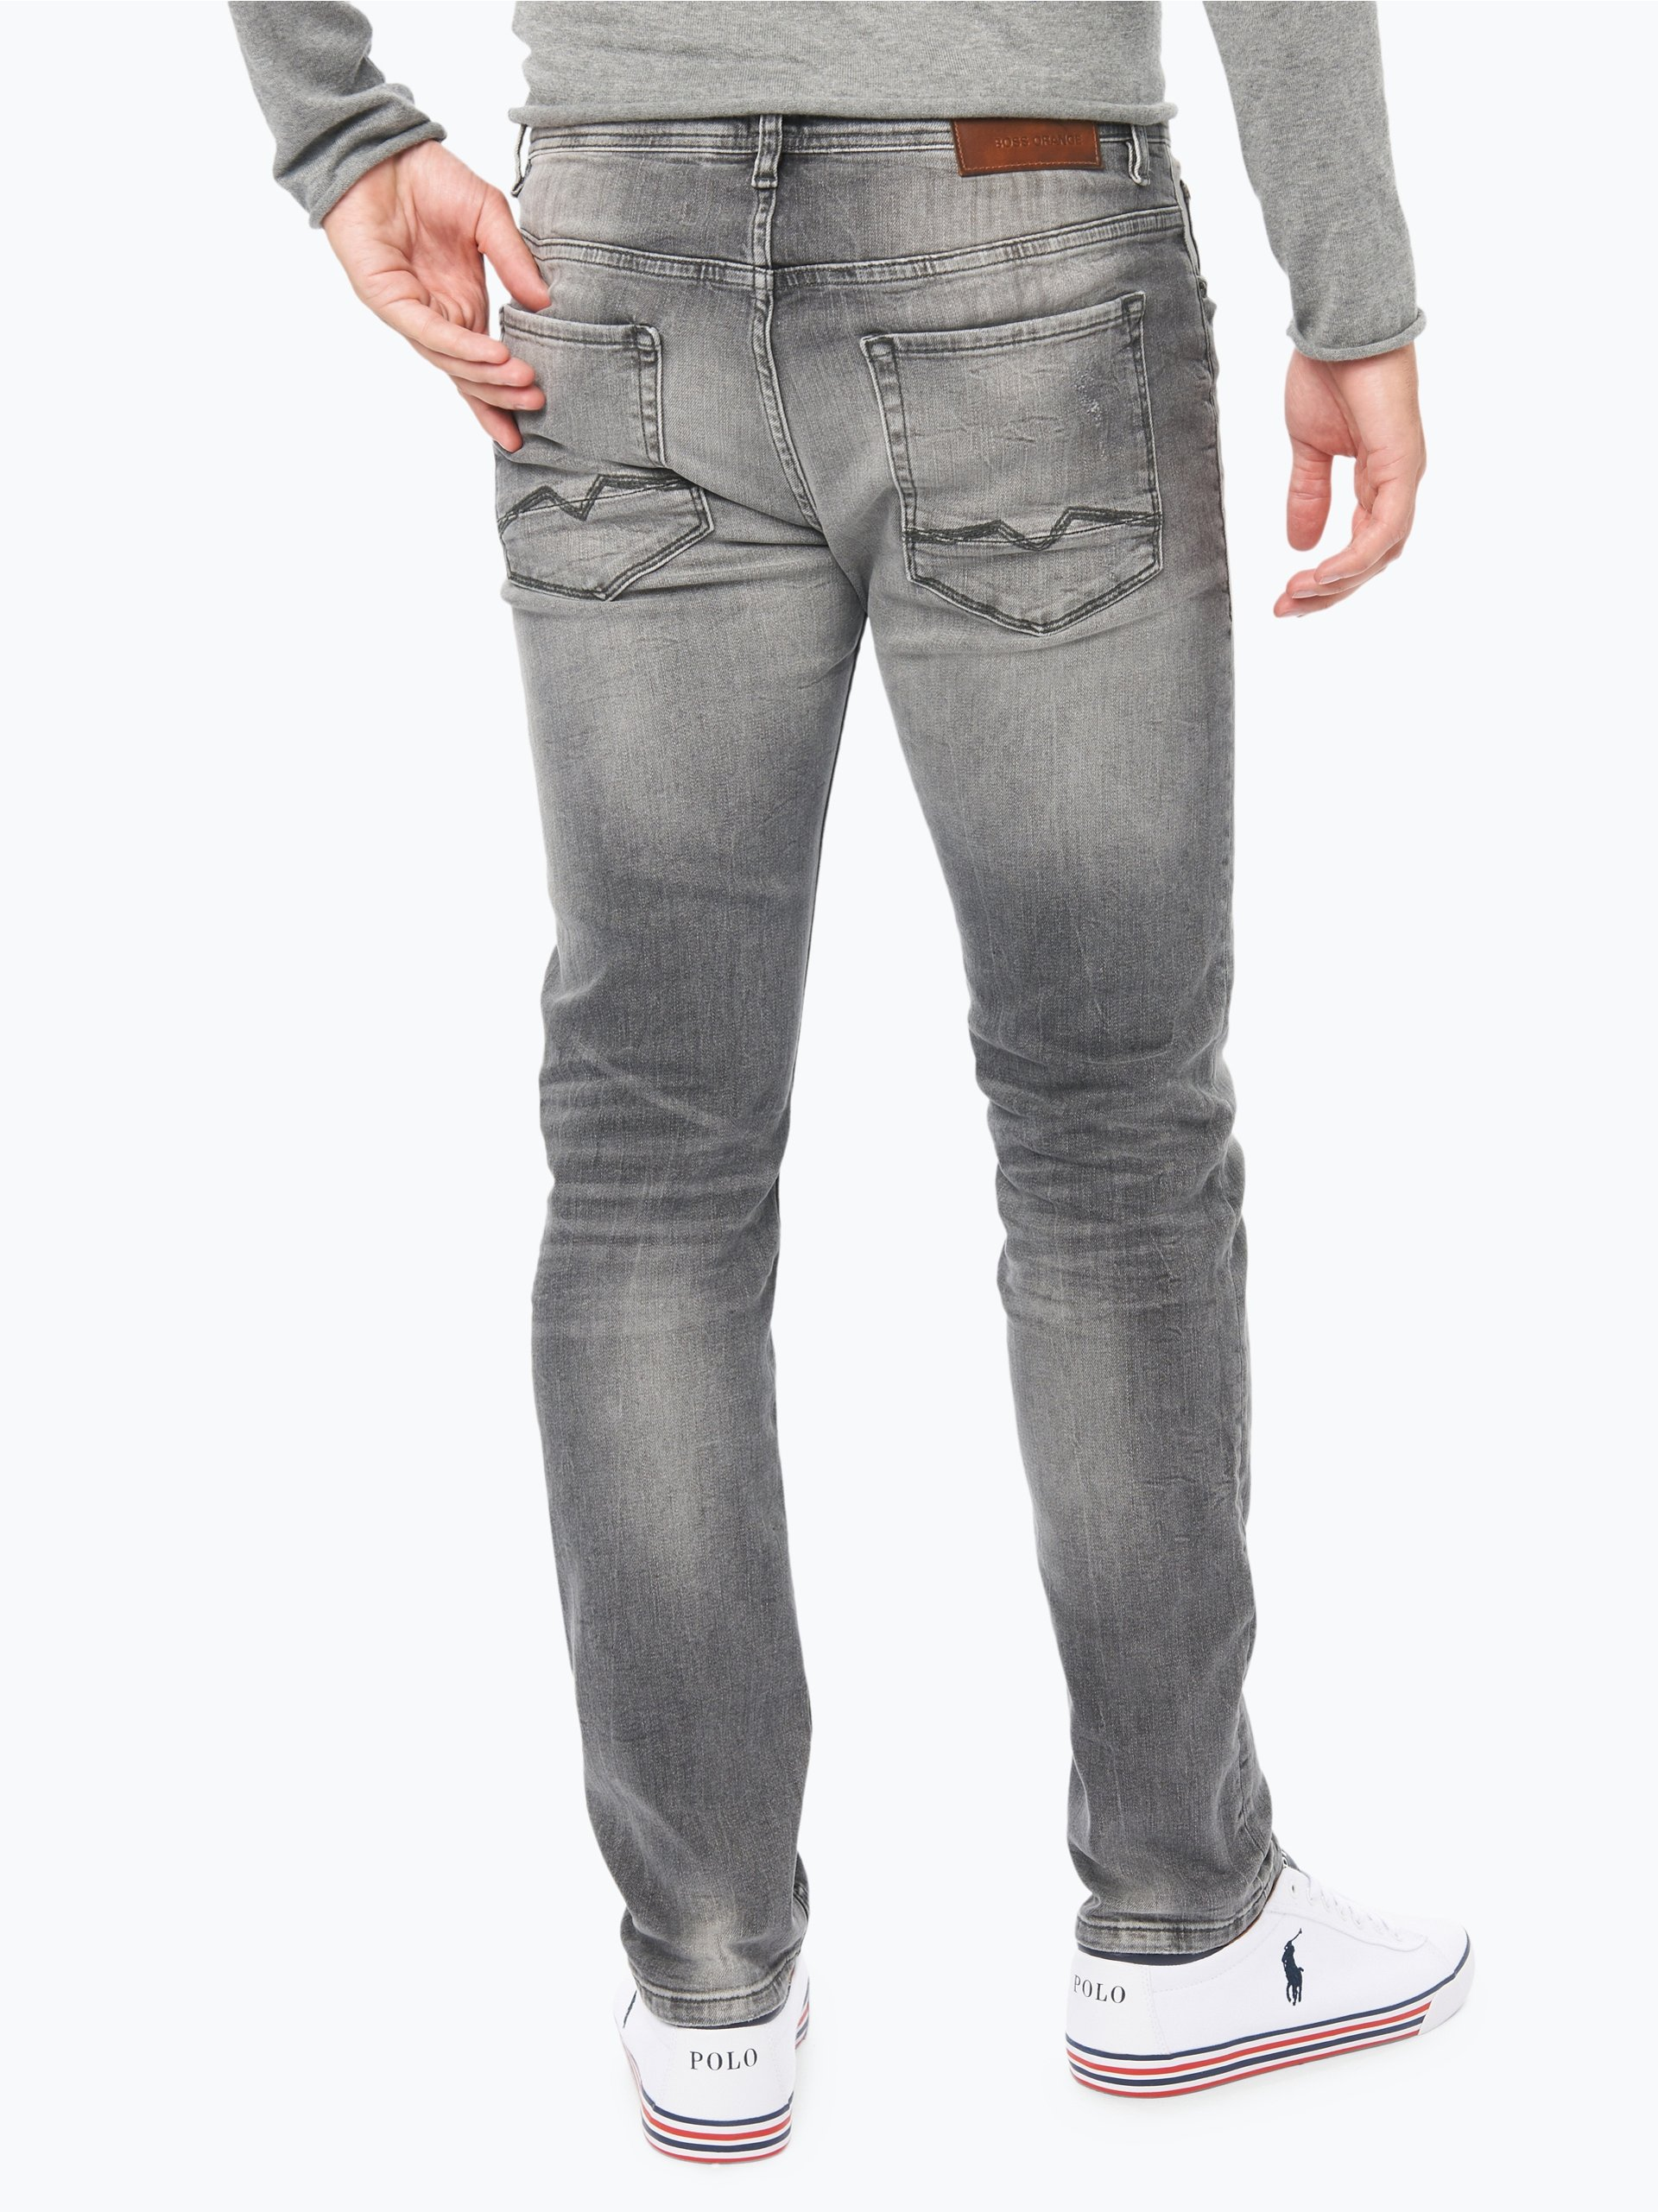 boss casual herren jeans orange 90 2 online kaufen peek und cloppenburg de. Black Bedroom Furniture Sets. Home Design Ideas